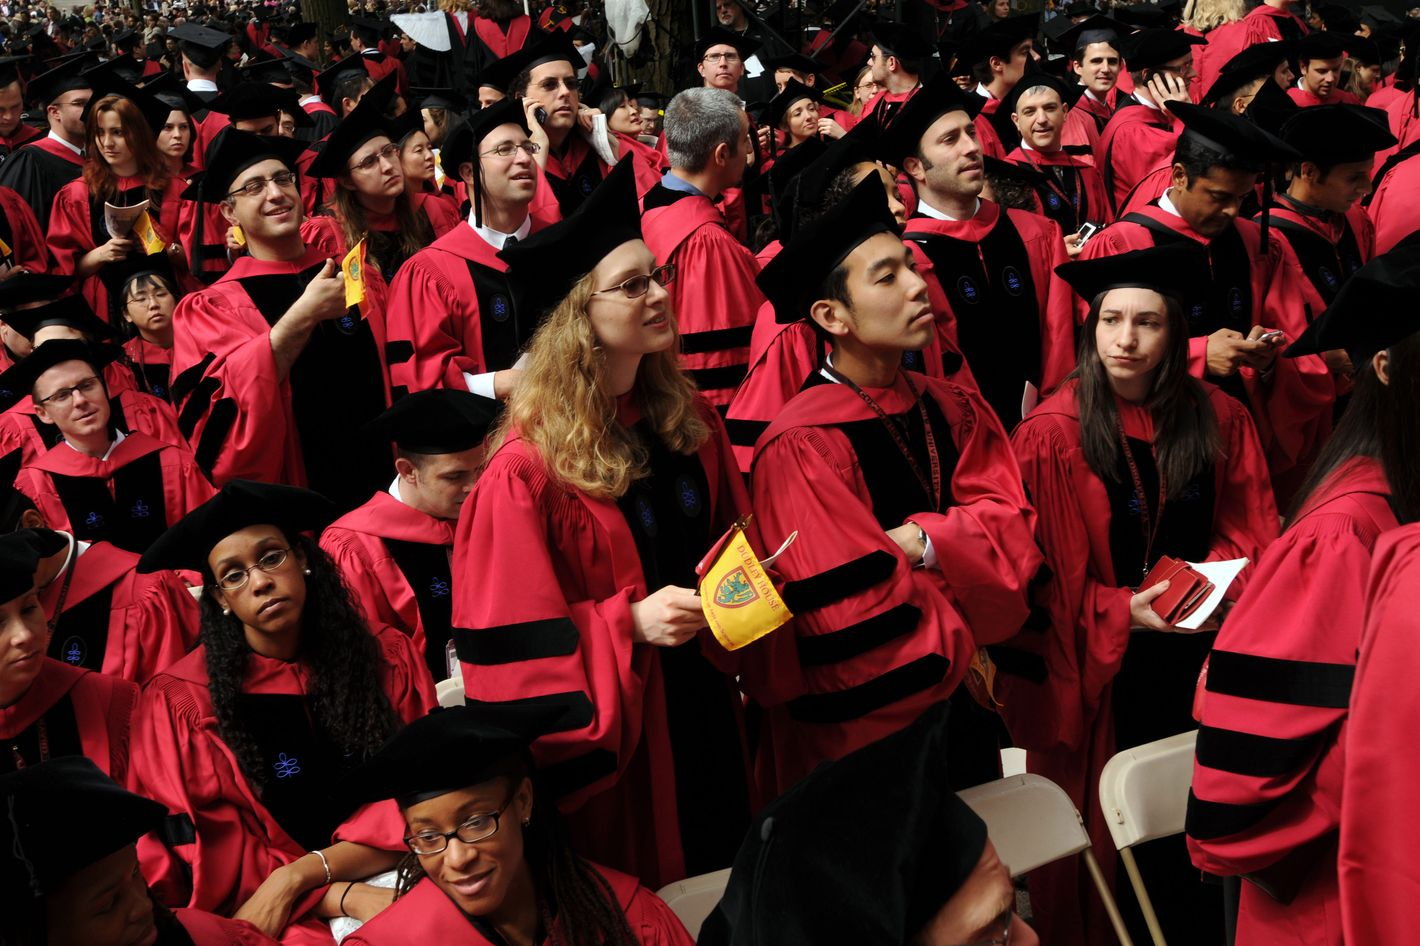 Harvard University students attend commencement ceremonies